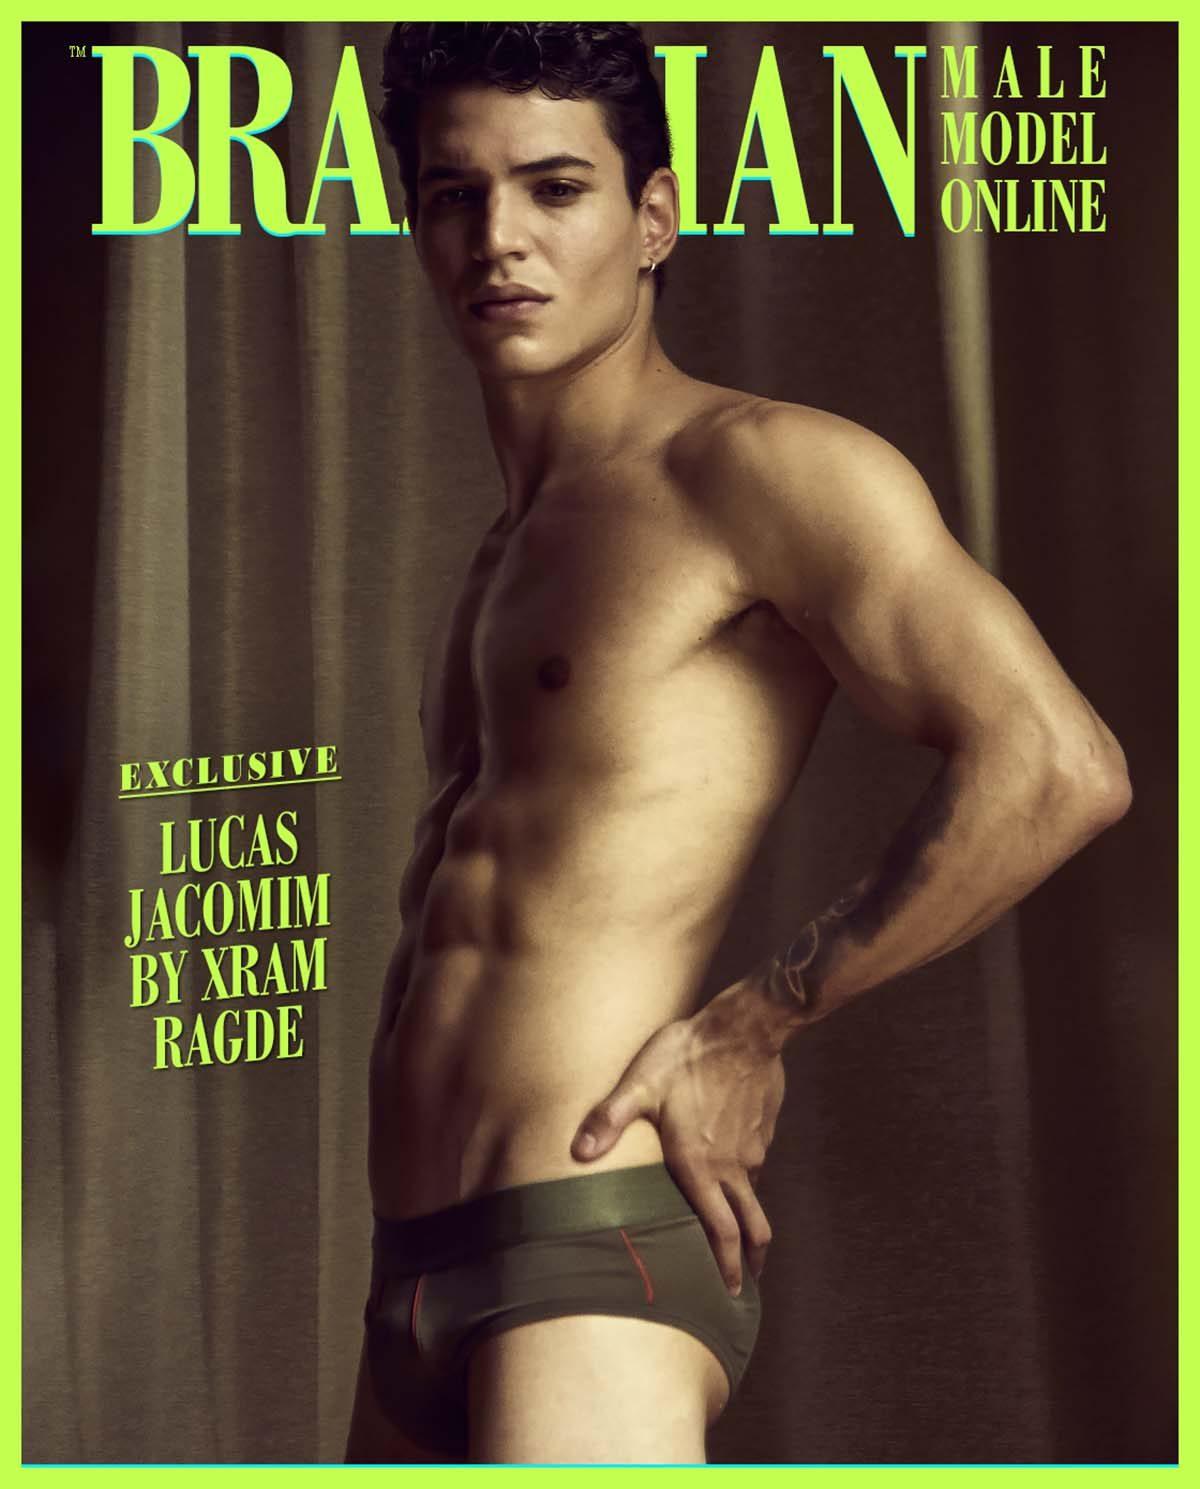 Lucas Jacomim by Xram Ragde